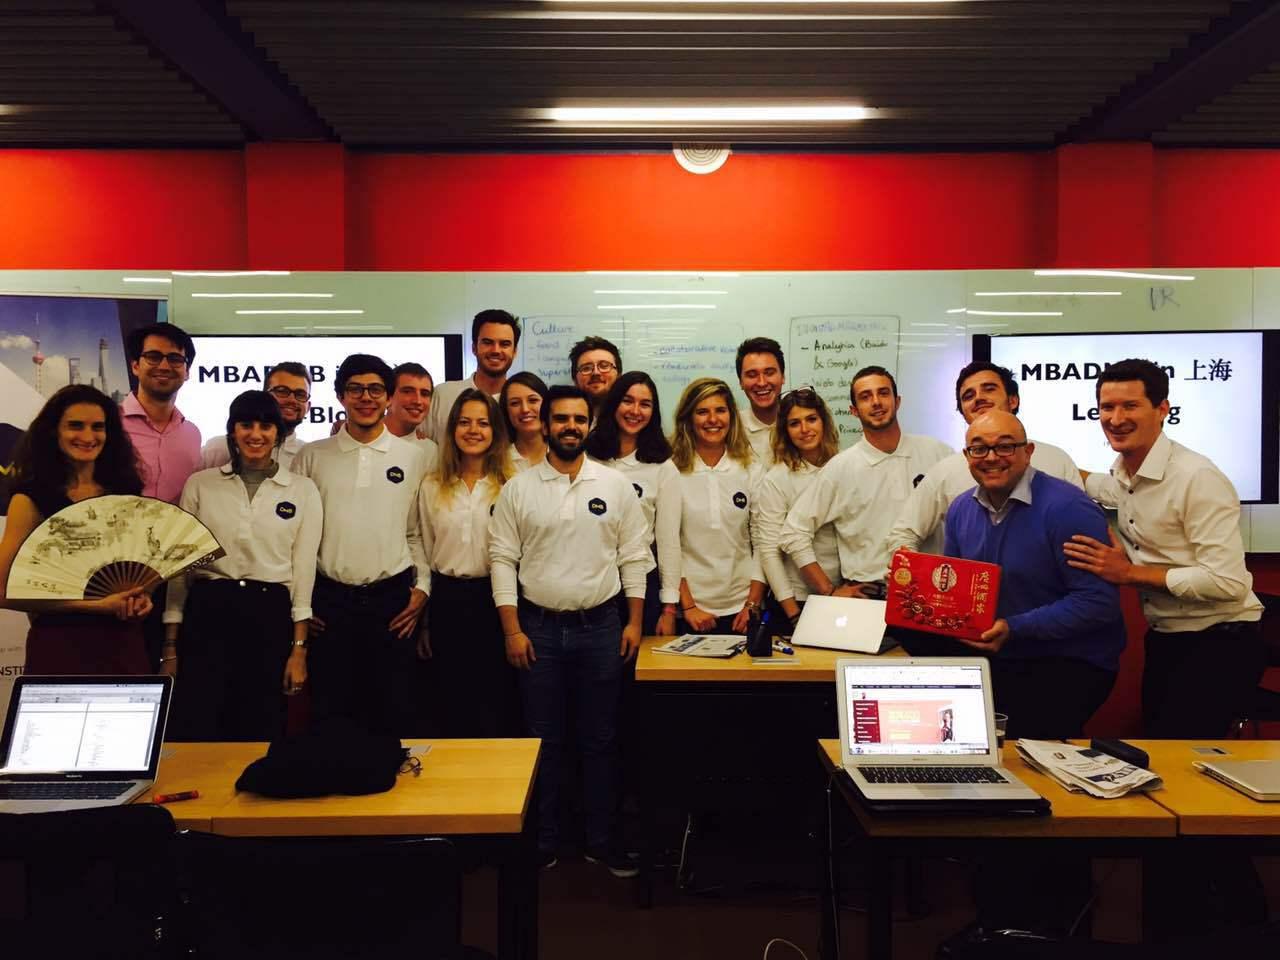 Blog du MBA DMB Shanghai, jour 1